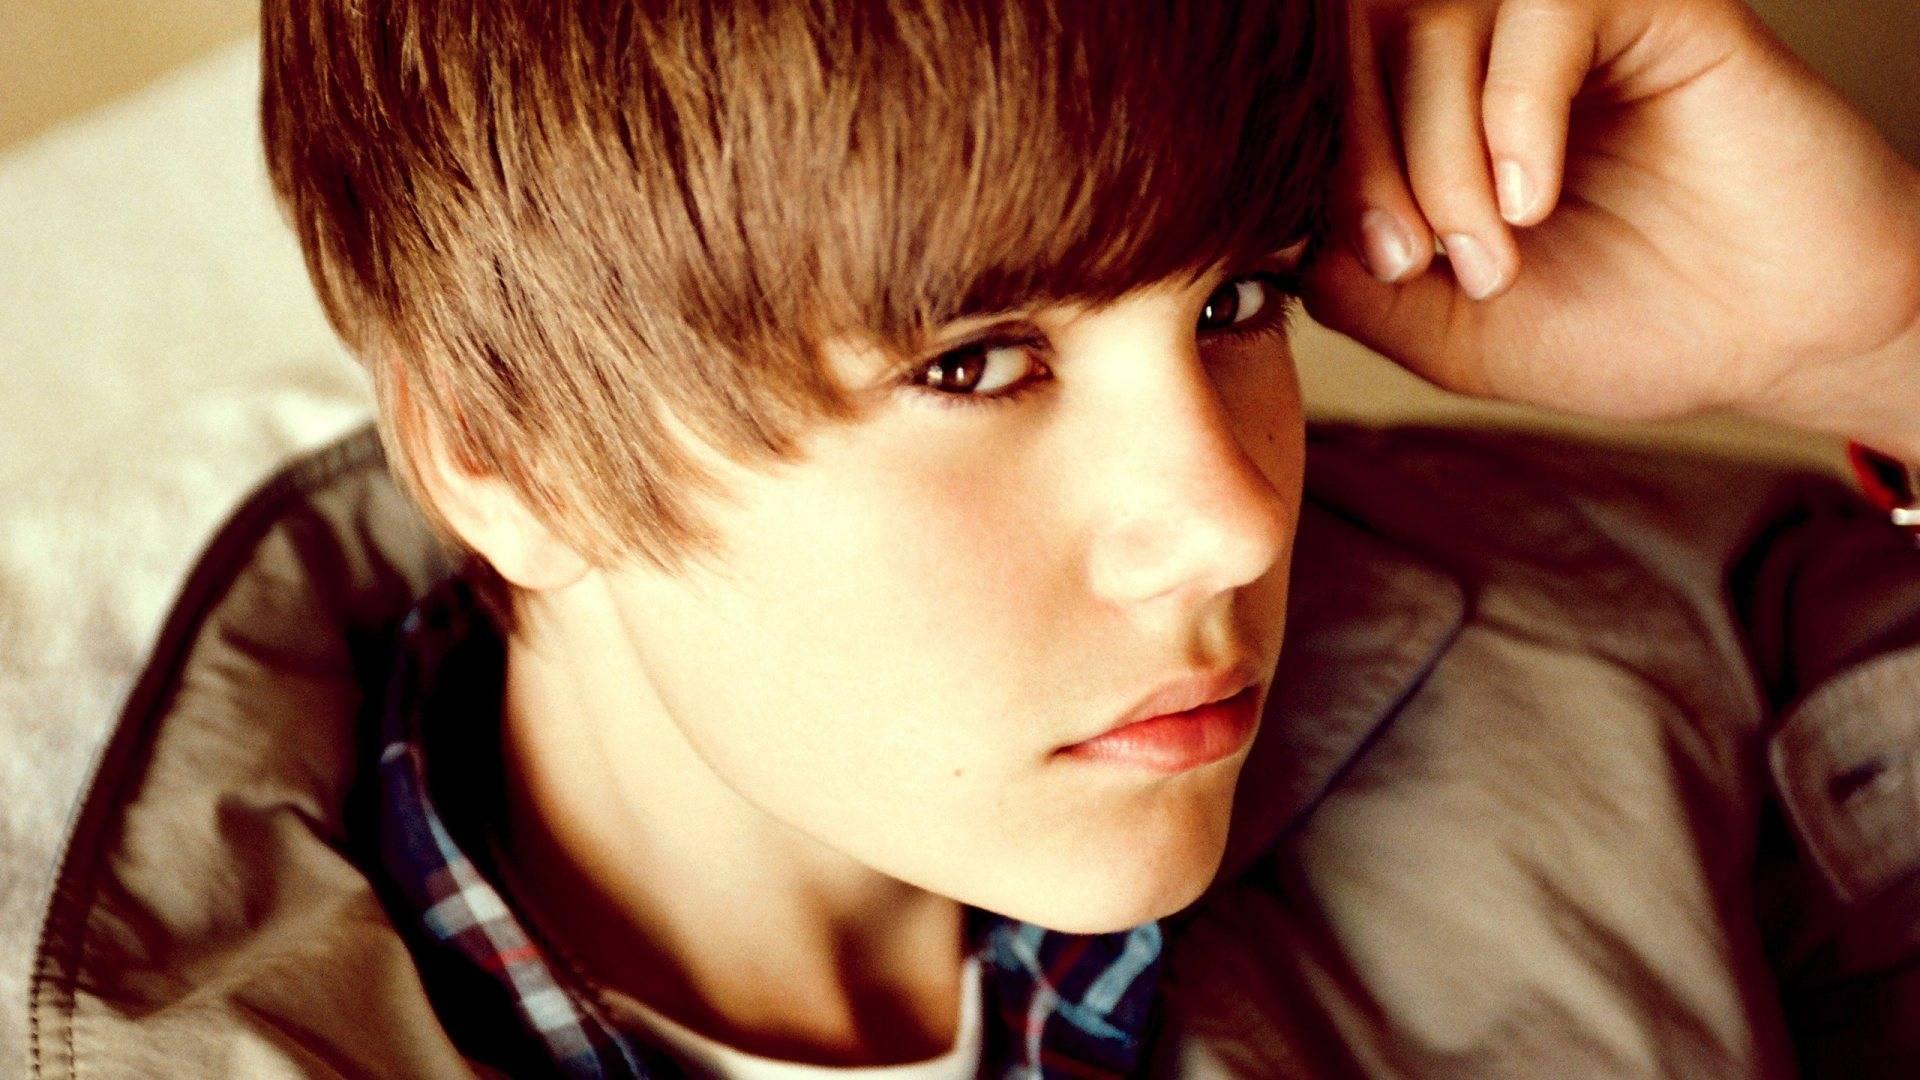 1920x1080px Imagenes De Justin Bieber Photos | #402922